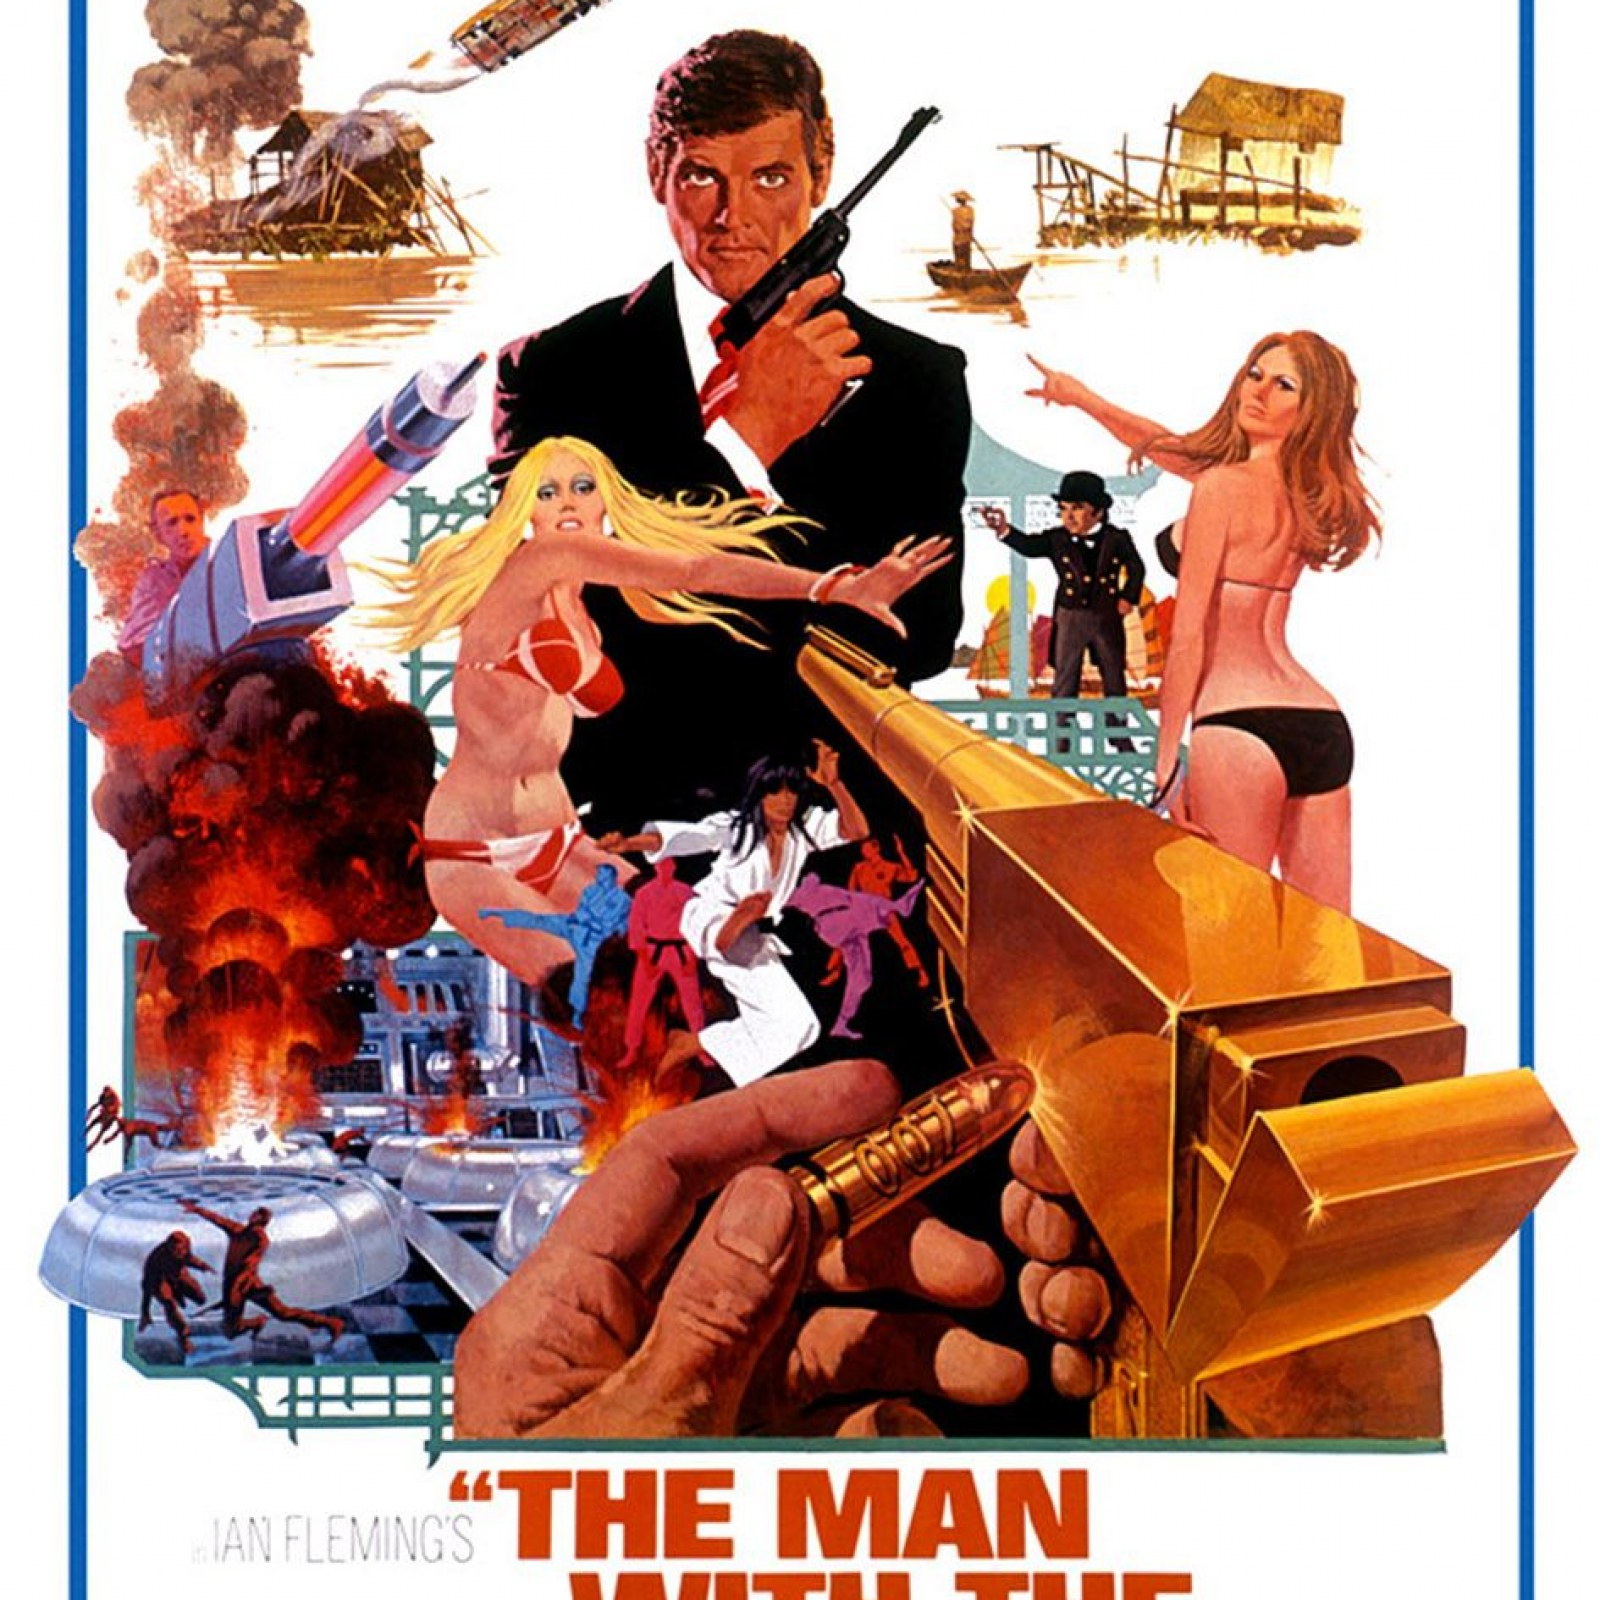 What Makes a Great James Bond Villain?